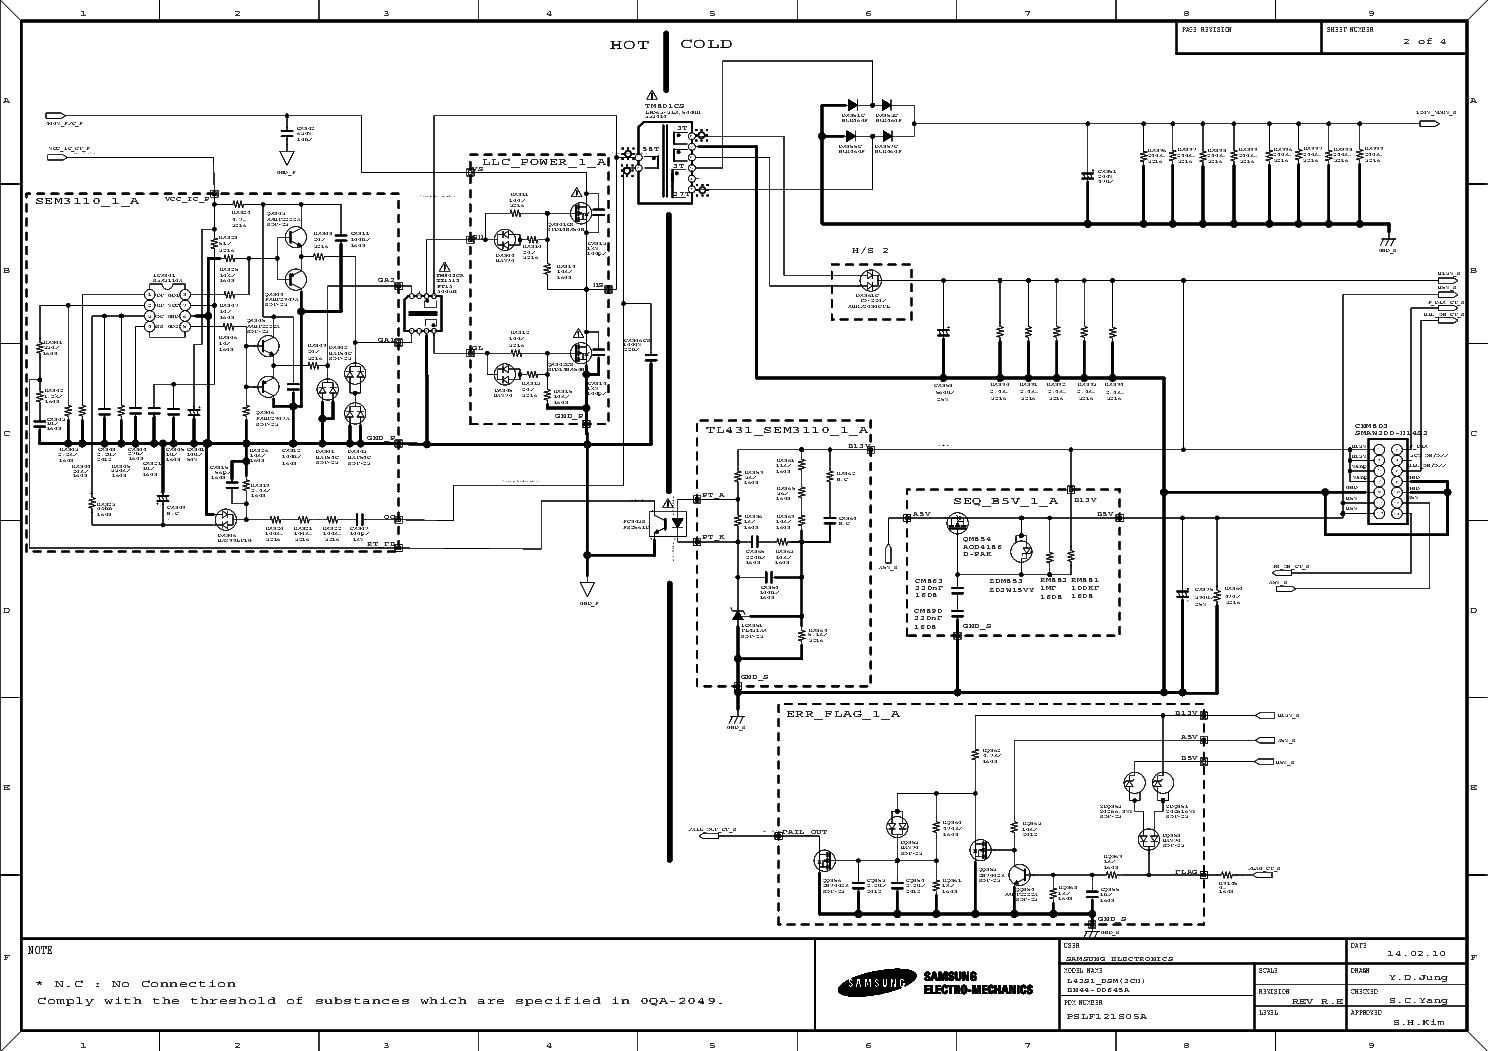 Smps Circuit Diagram With Explanation Pdf - Diagram